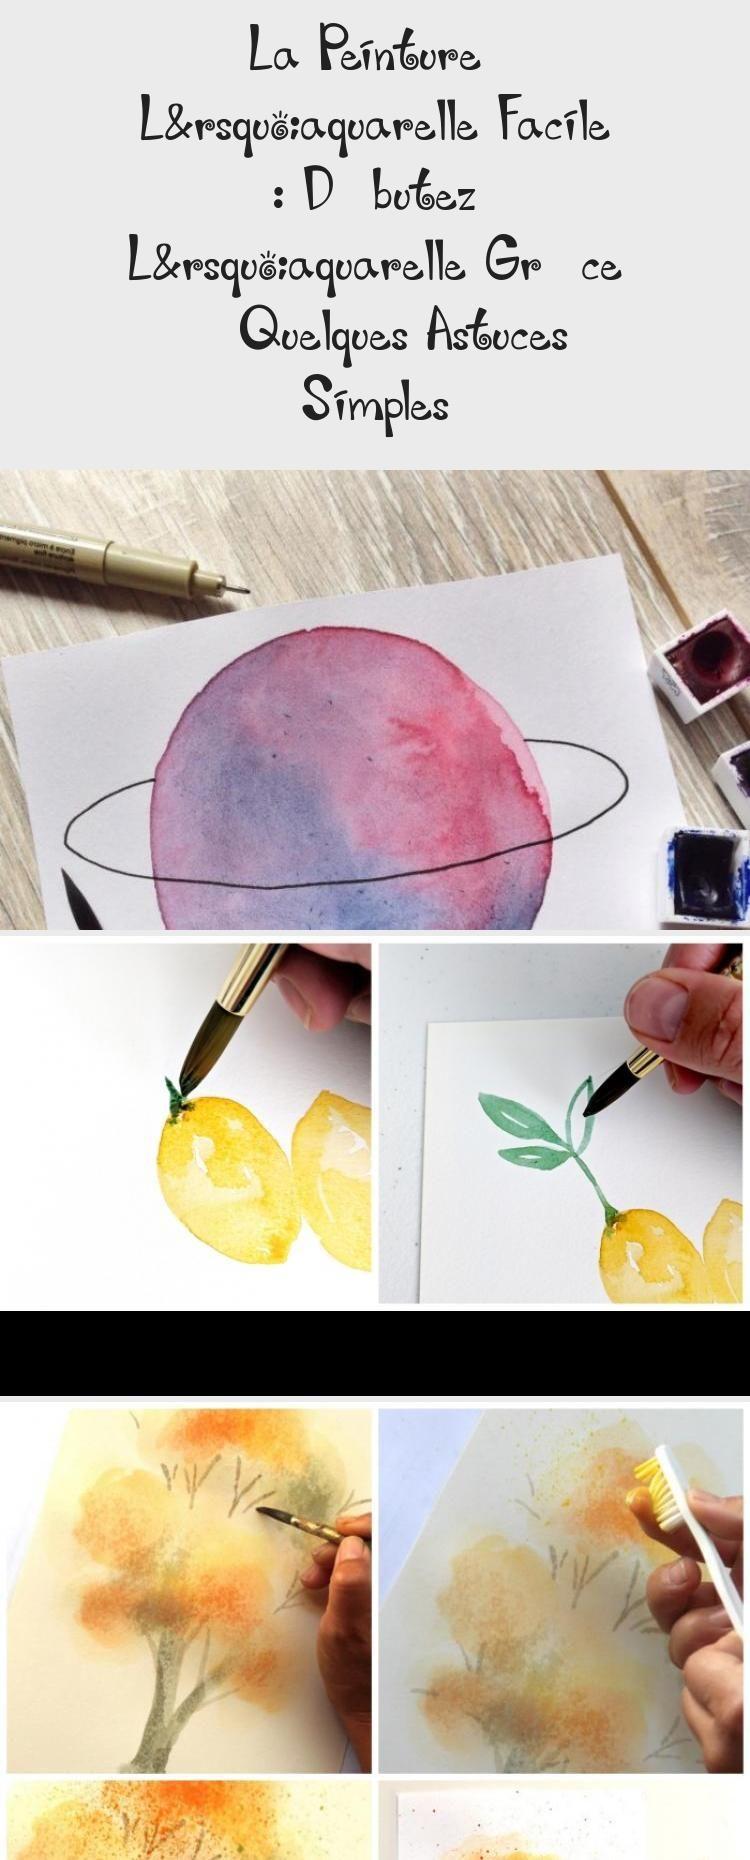 La Peinture A L Aquarelle Facile Debutez L Aquarelle Grace A